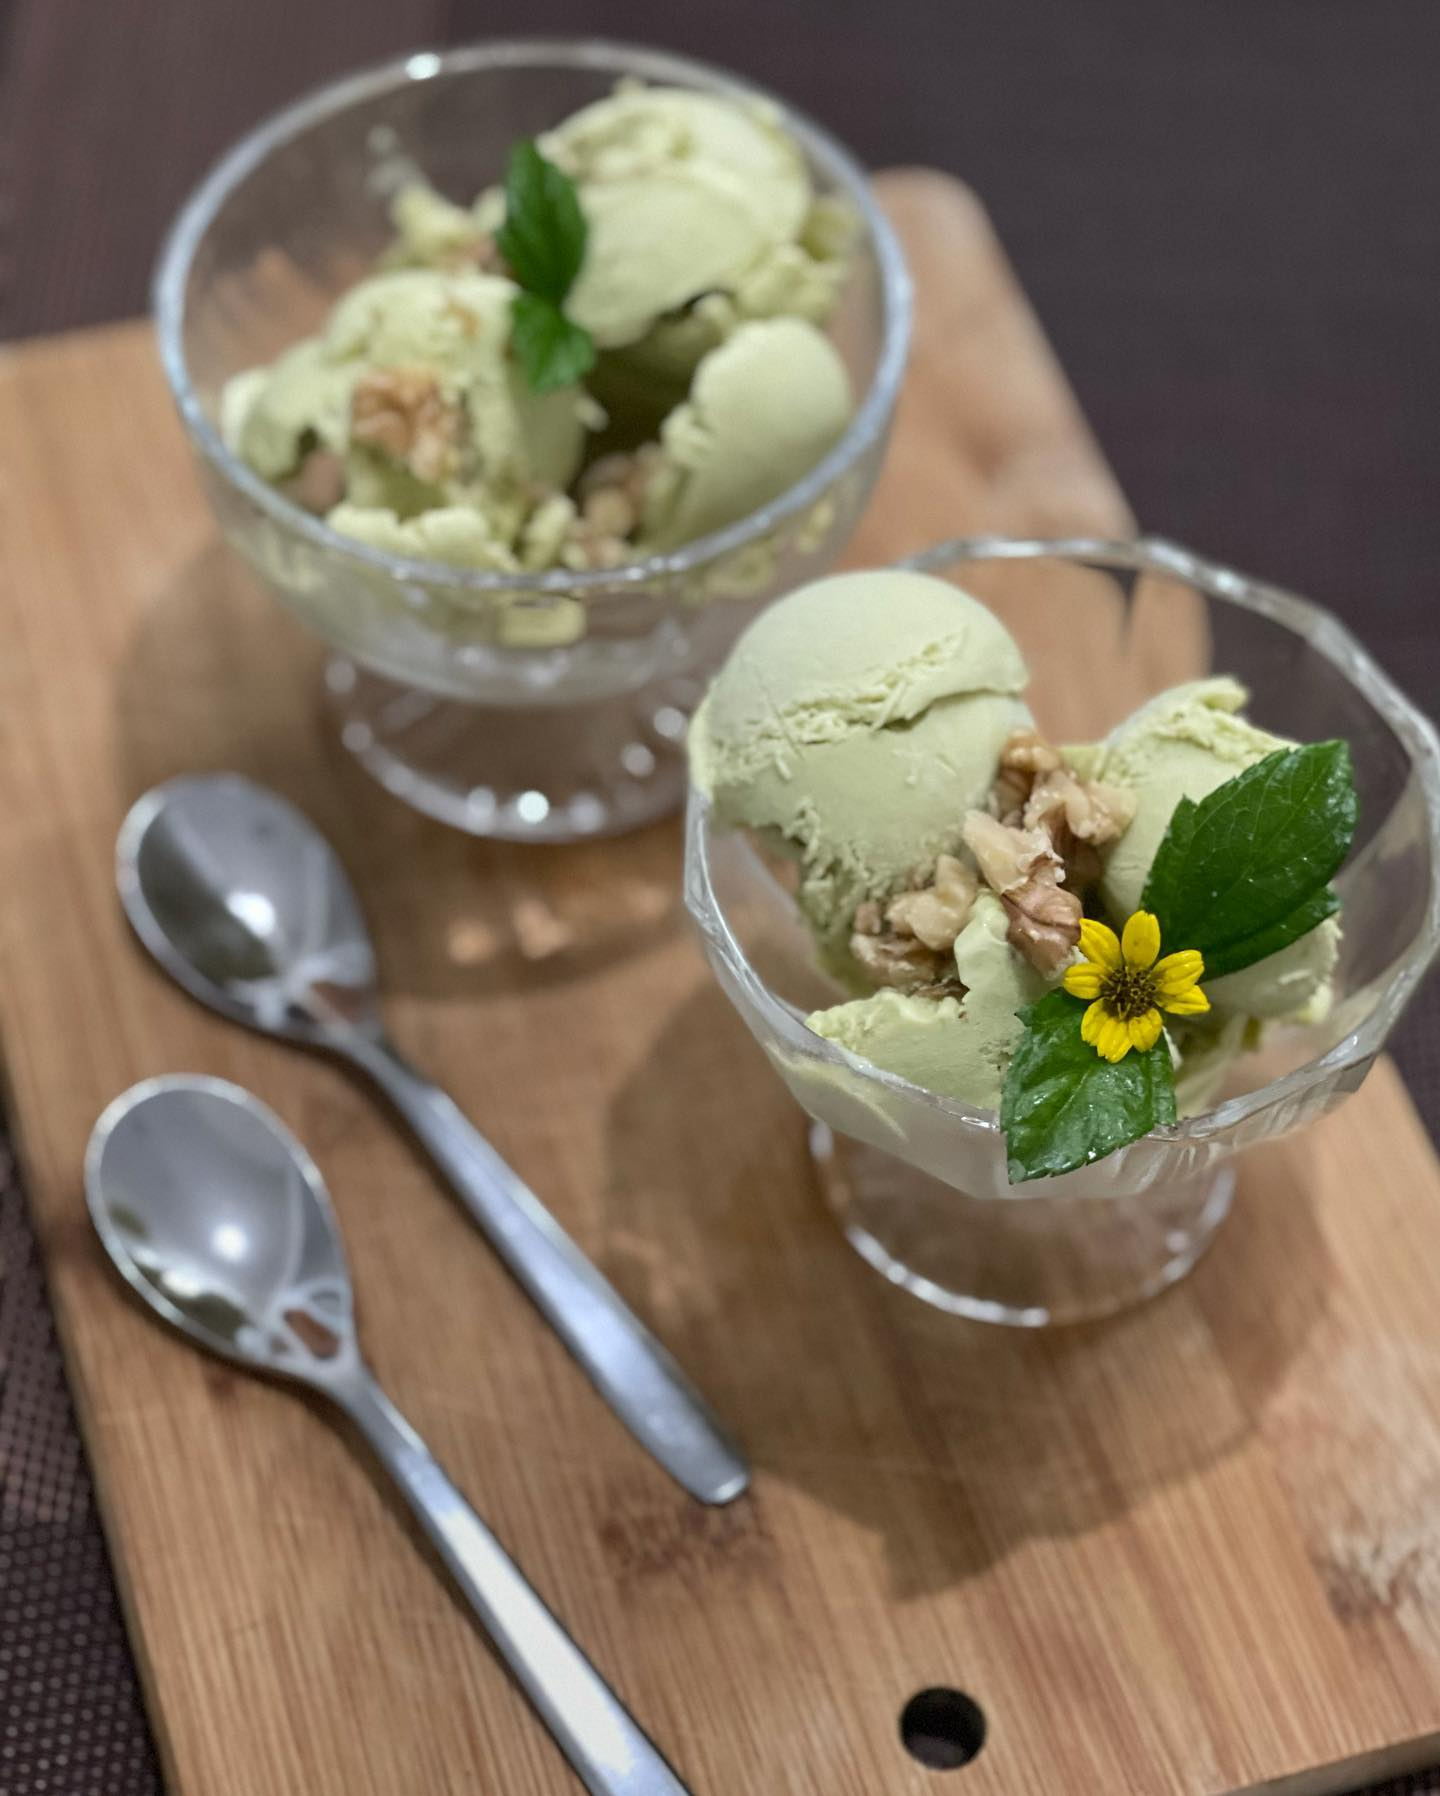 Cool Dessert - No Churn Homemade Avocado Ice Cream  - House of Hazelknots